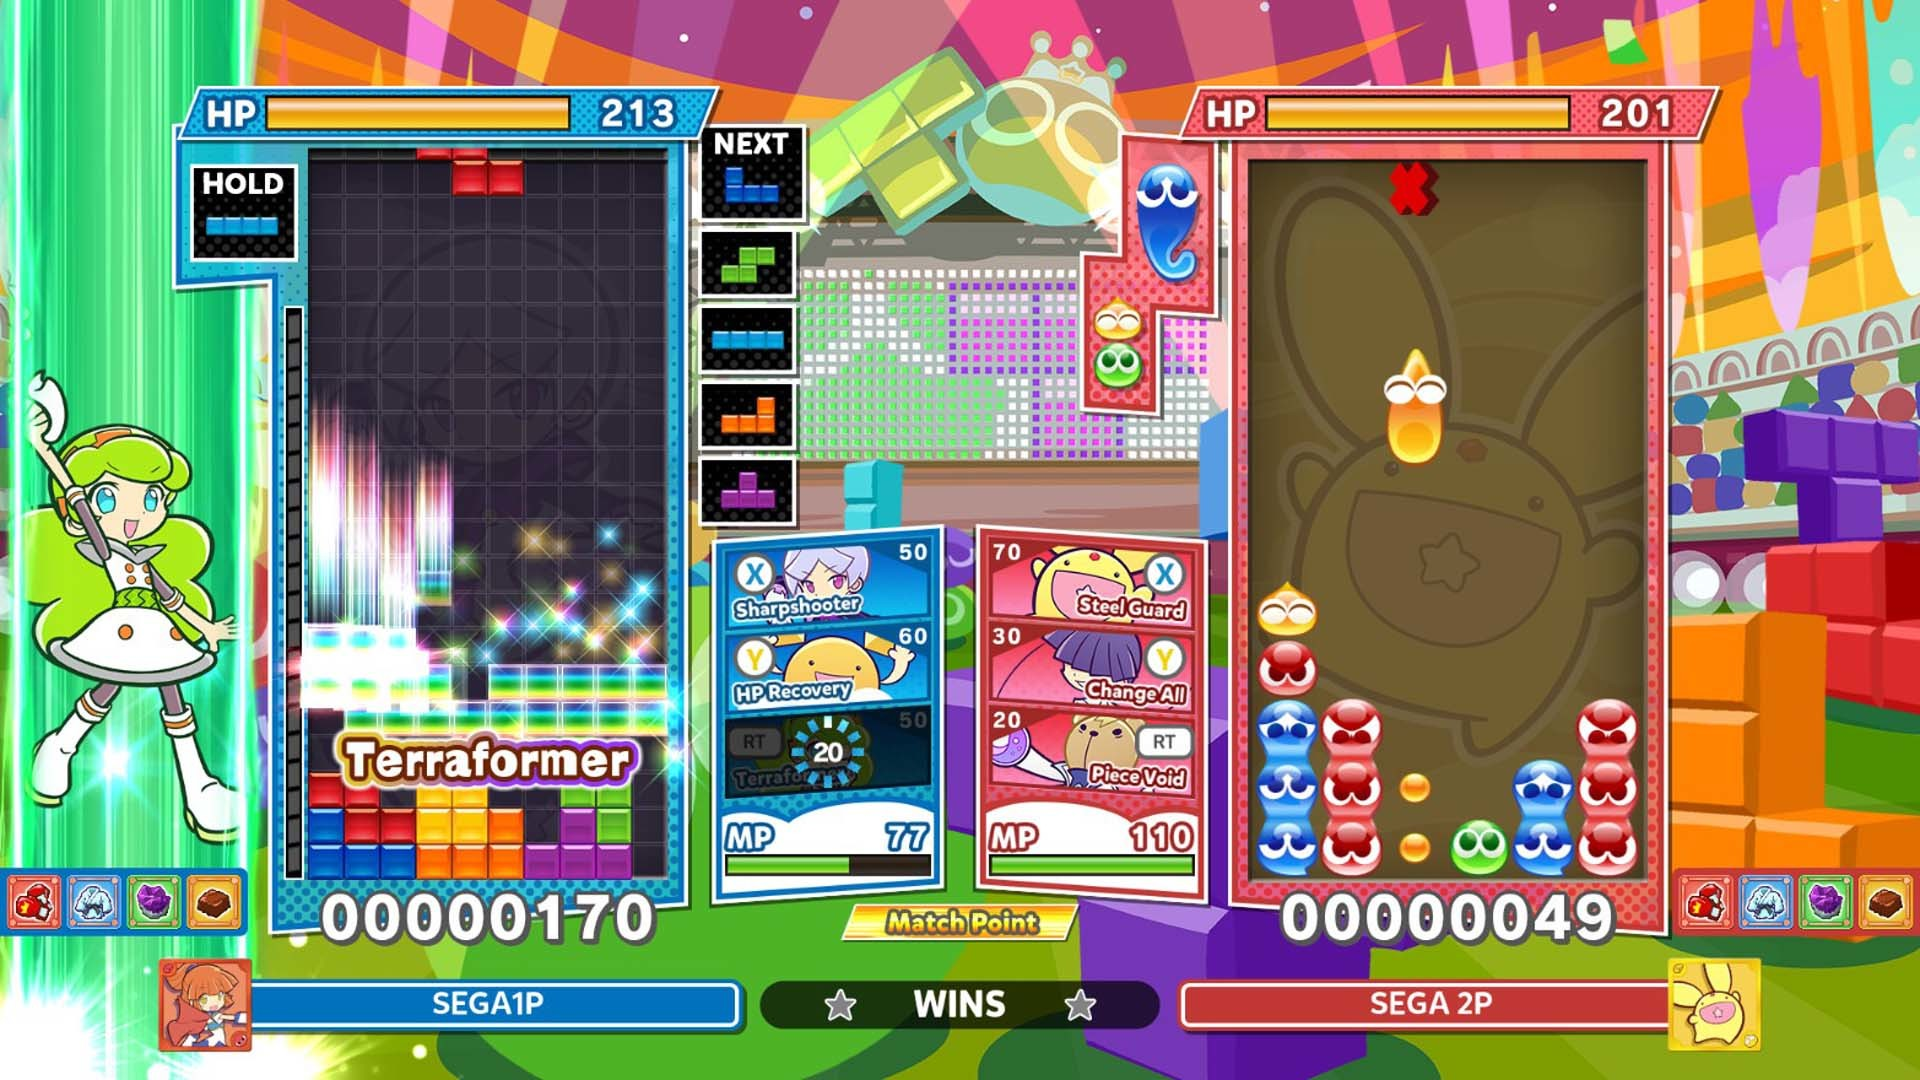 puyopuyo-tetris-2-pc-screenshot-4